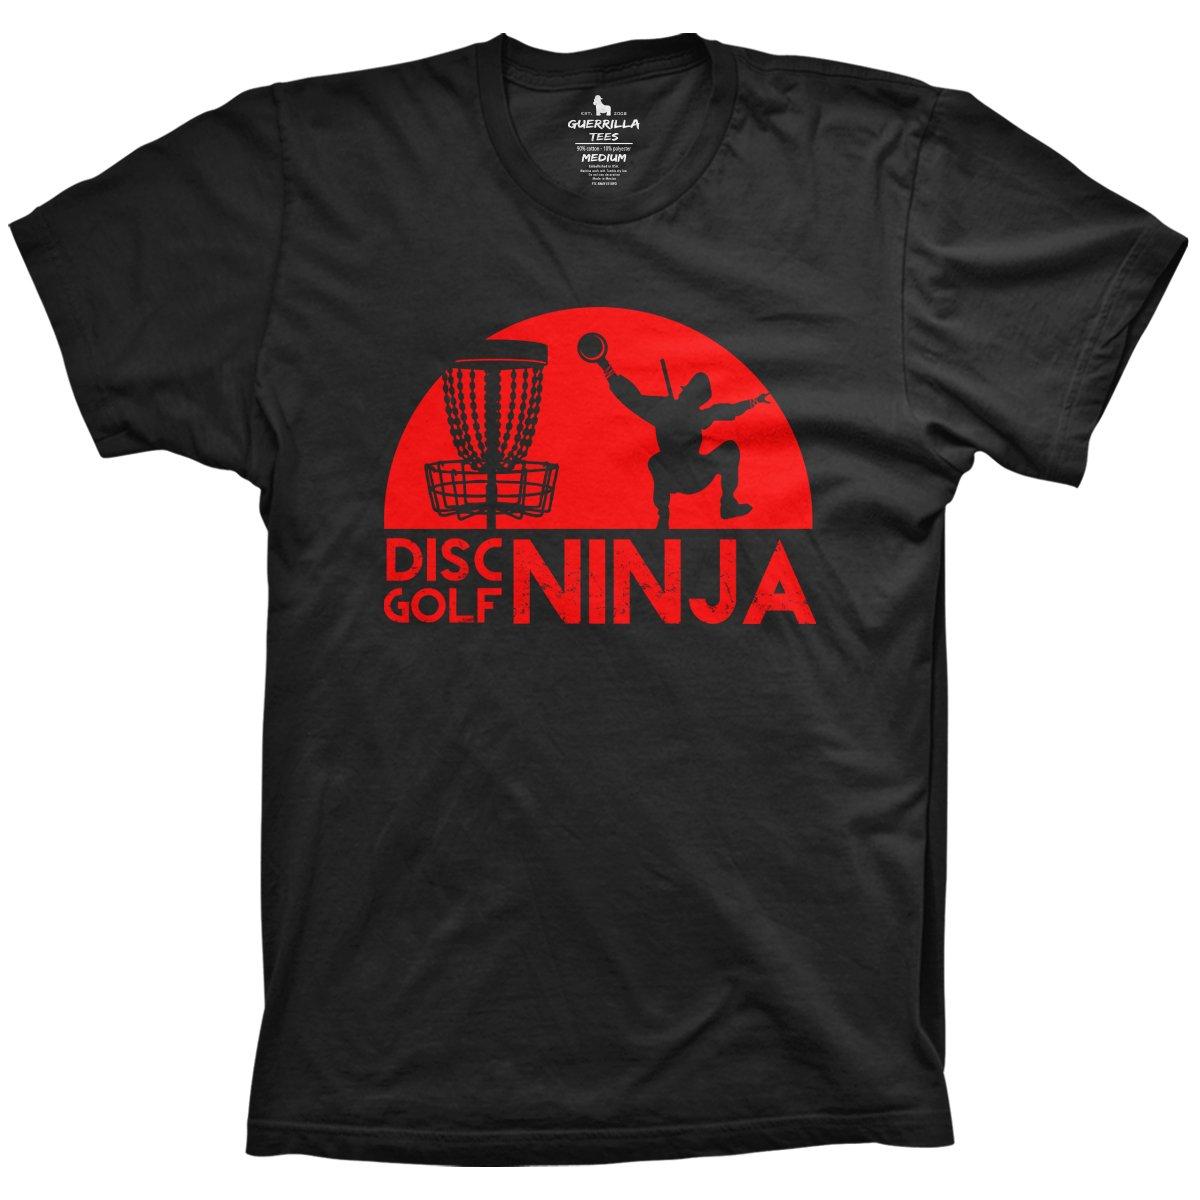 Disc Golf Ninja